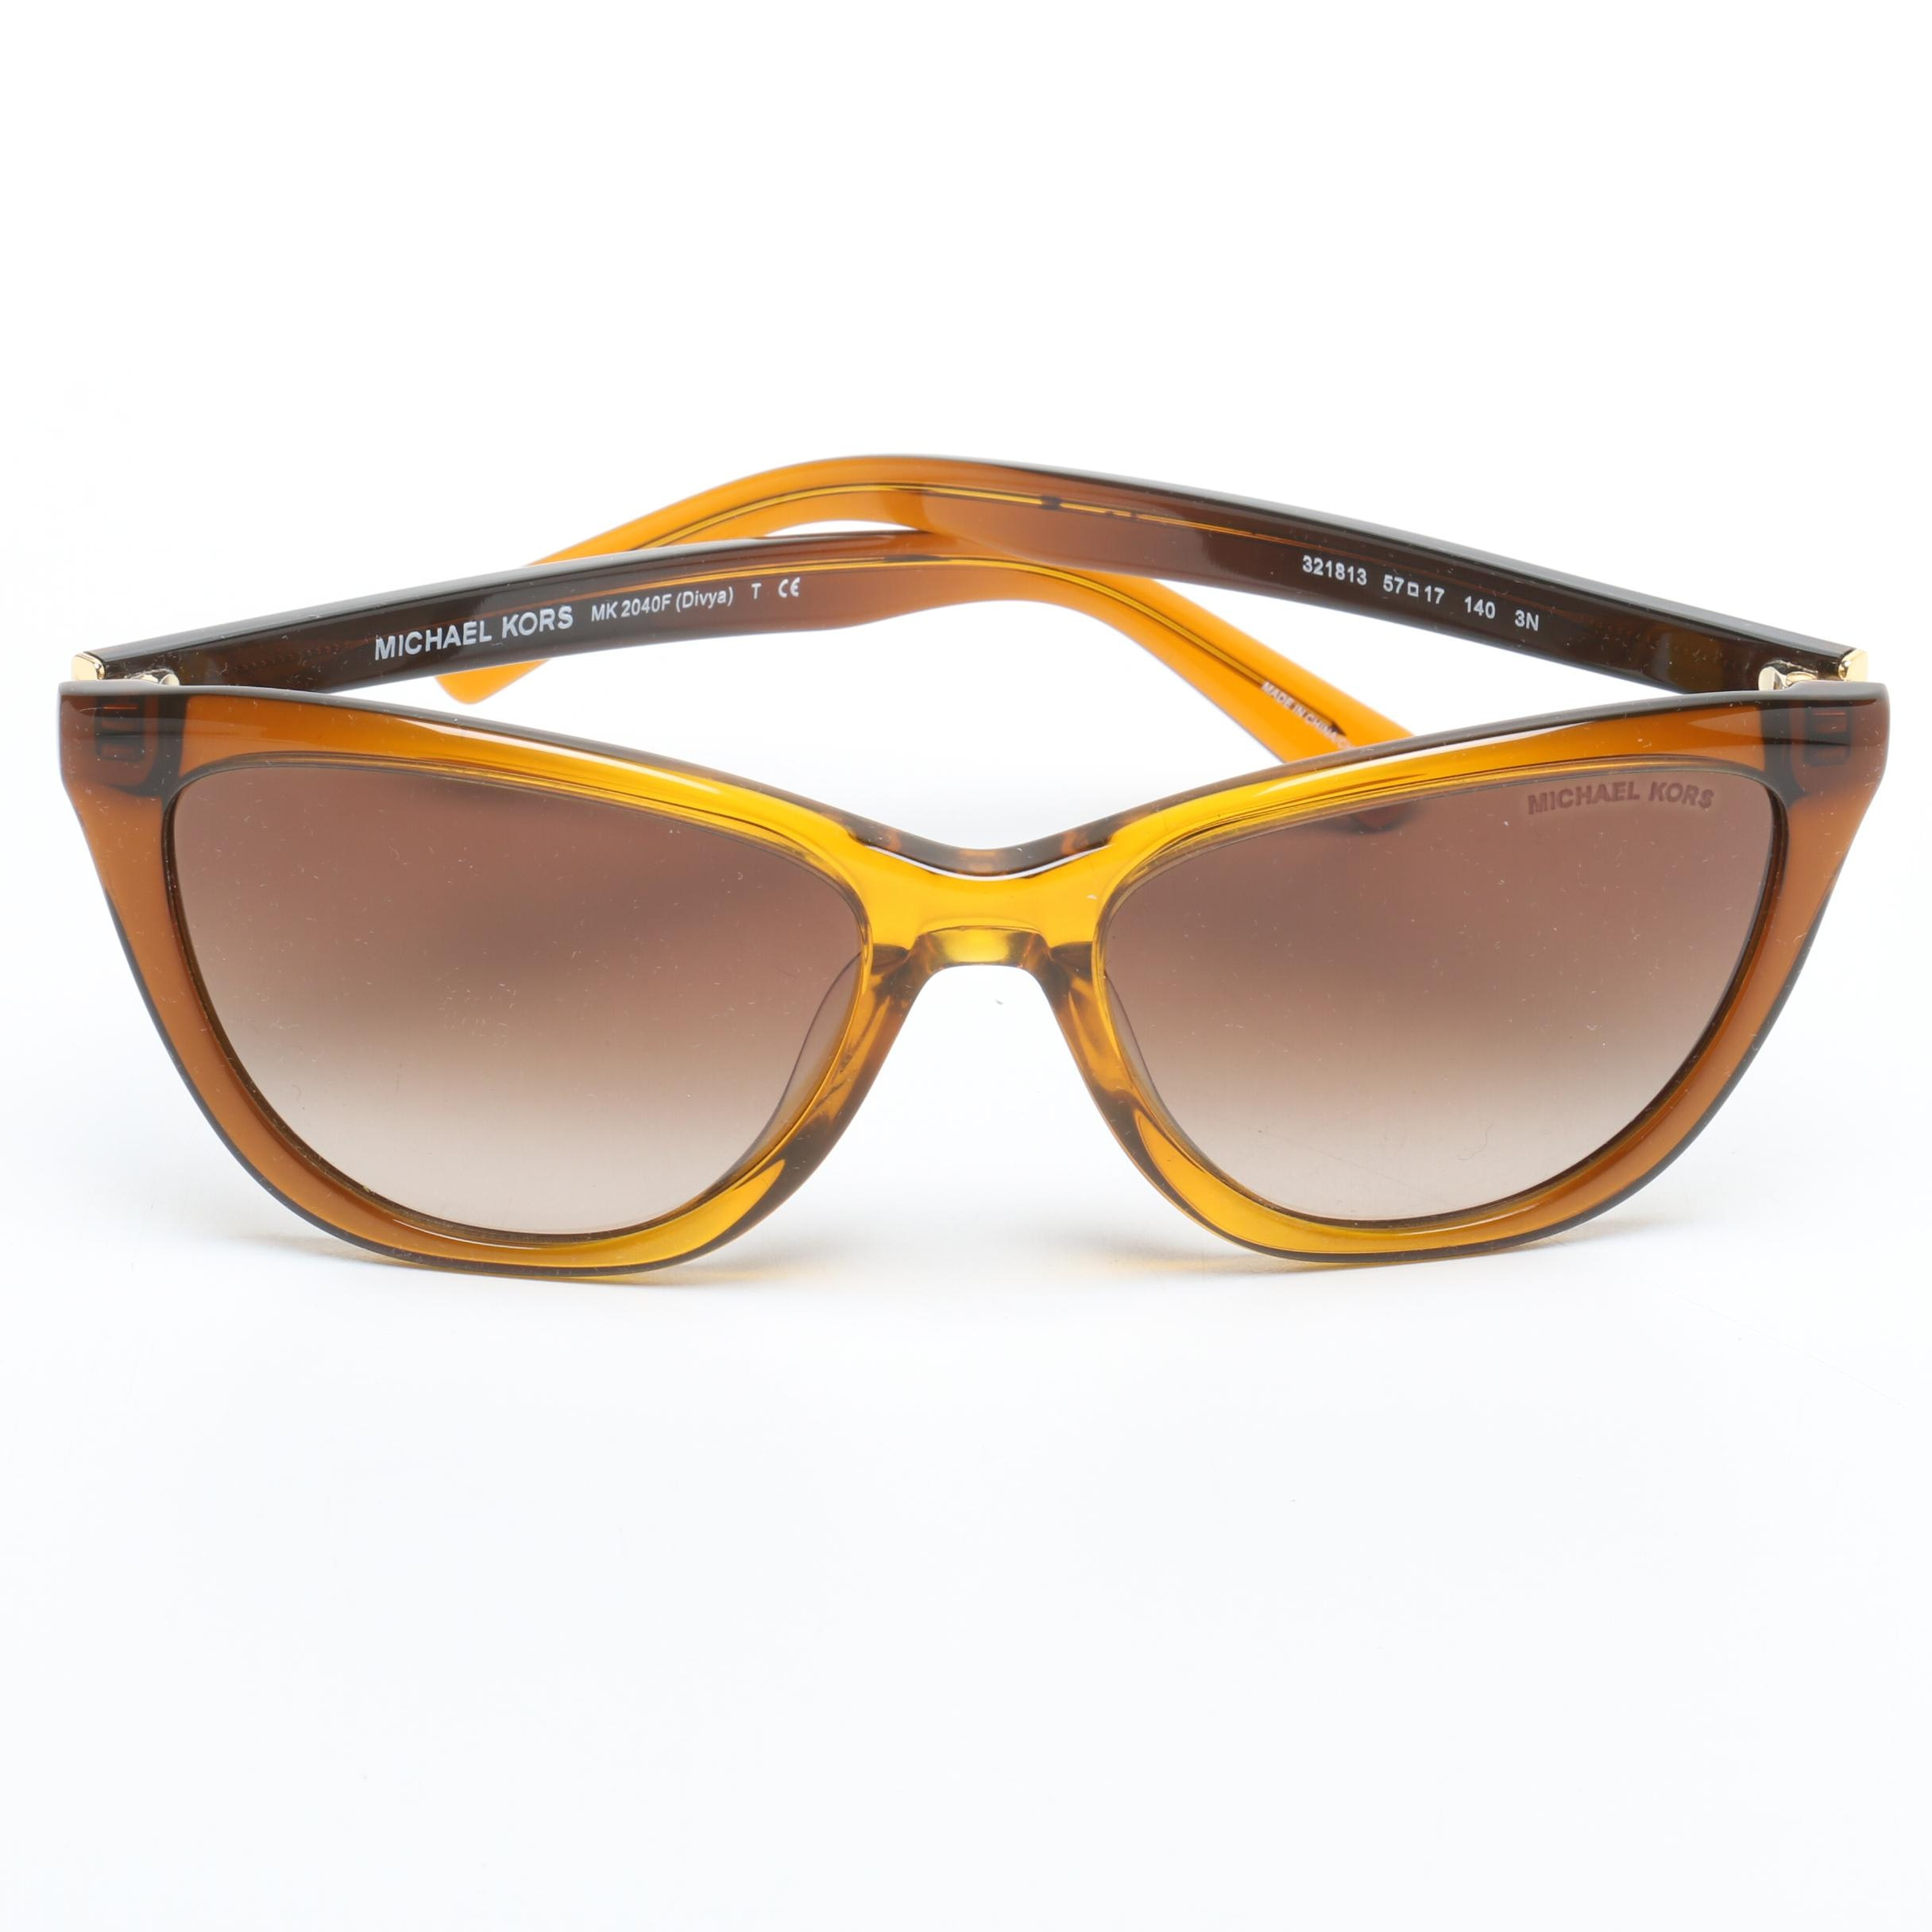 Michael Kors Divya Brown Translucent Cat Eye Sunglasses with Case